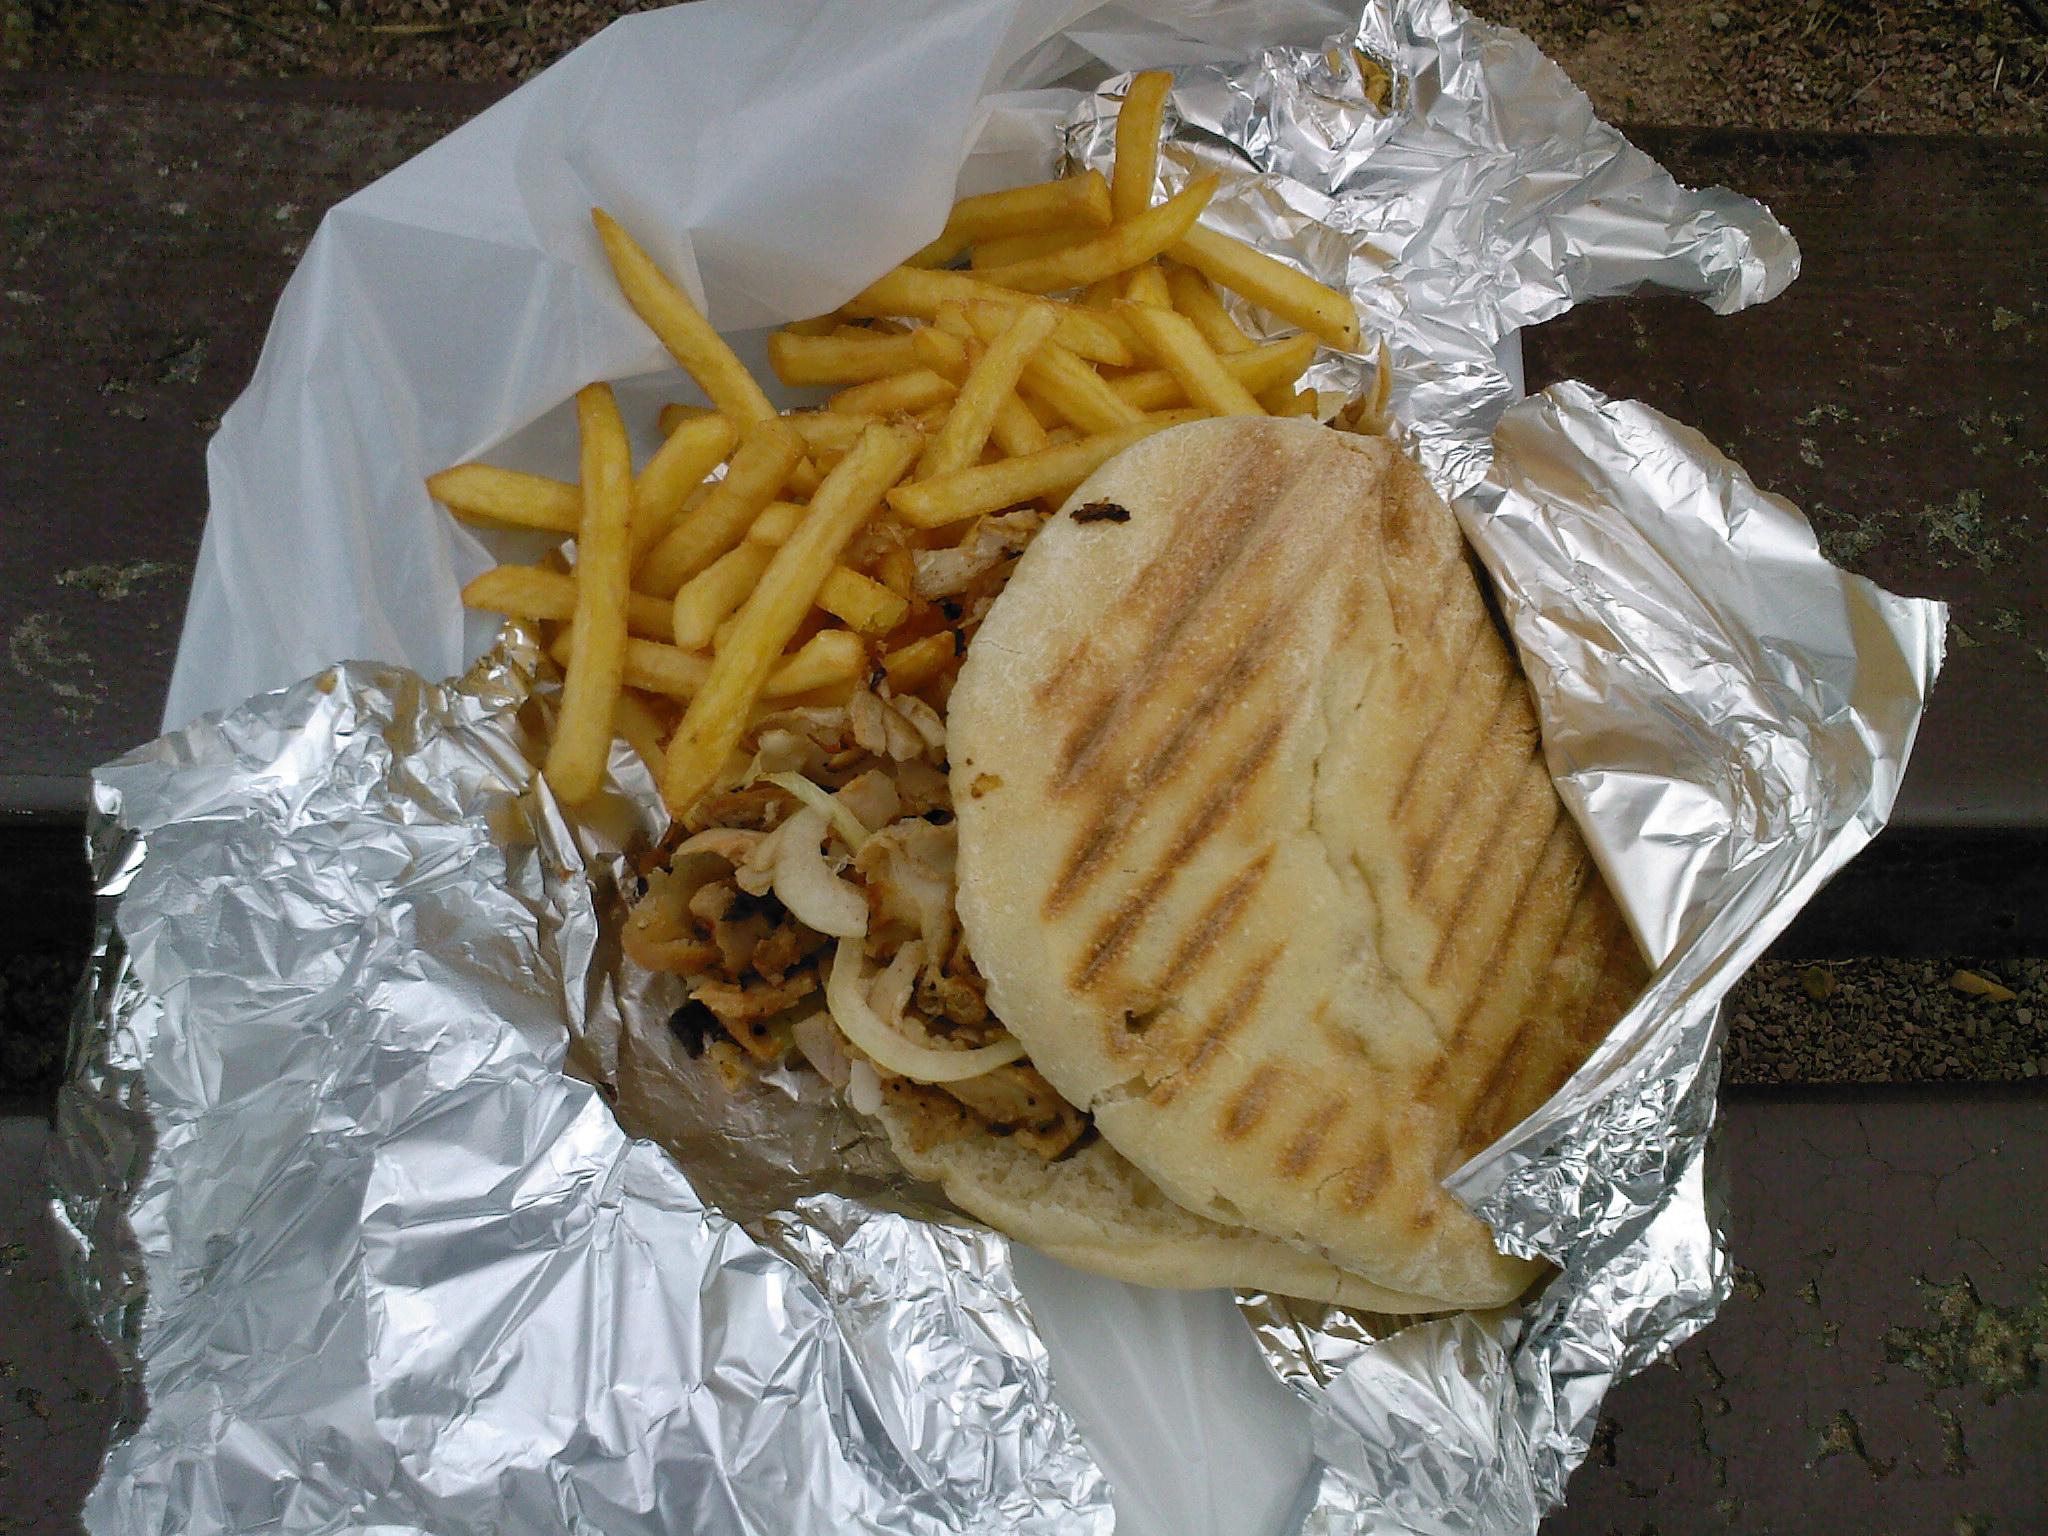 Sandwich Kebab - King kébab à St Jean de Monts